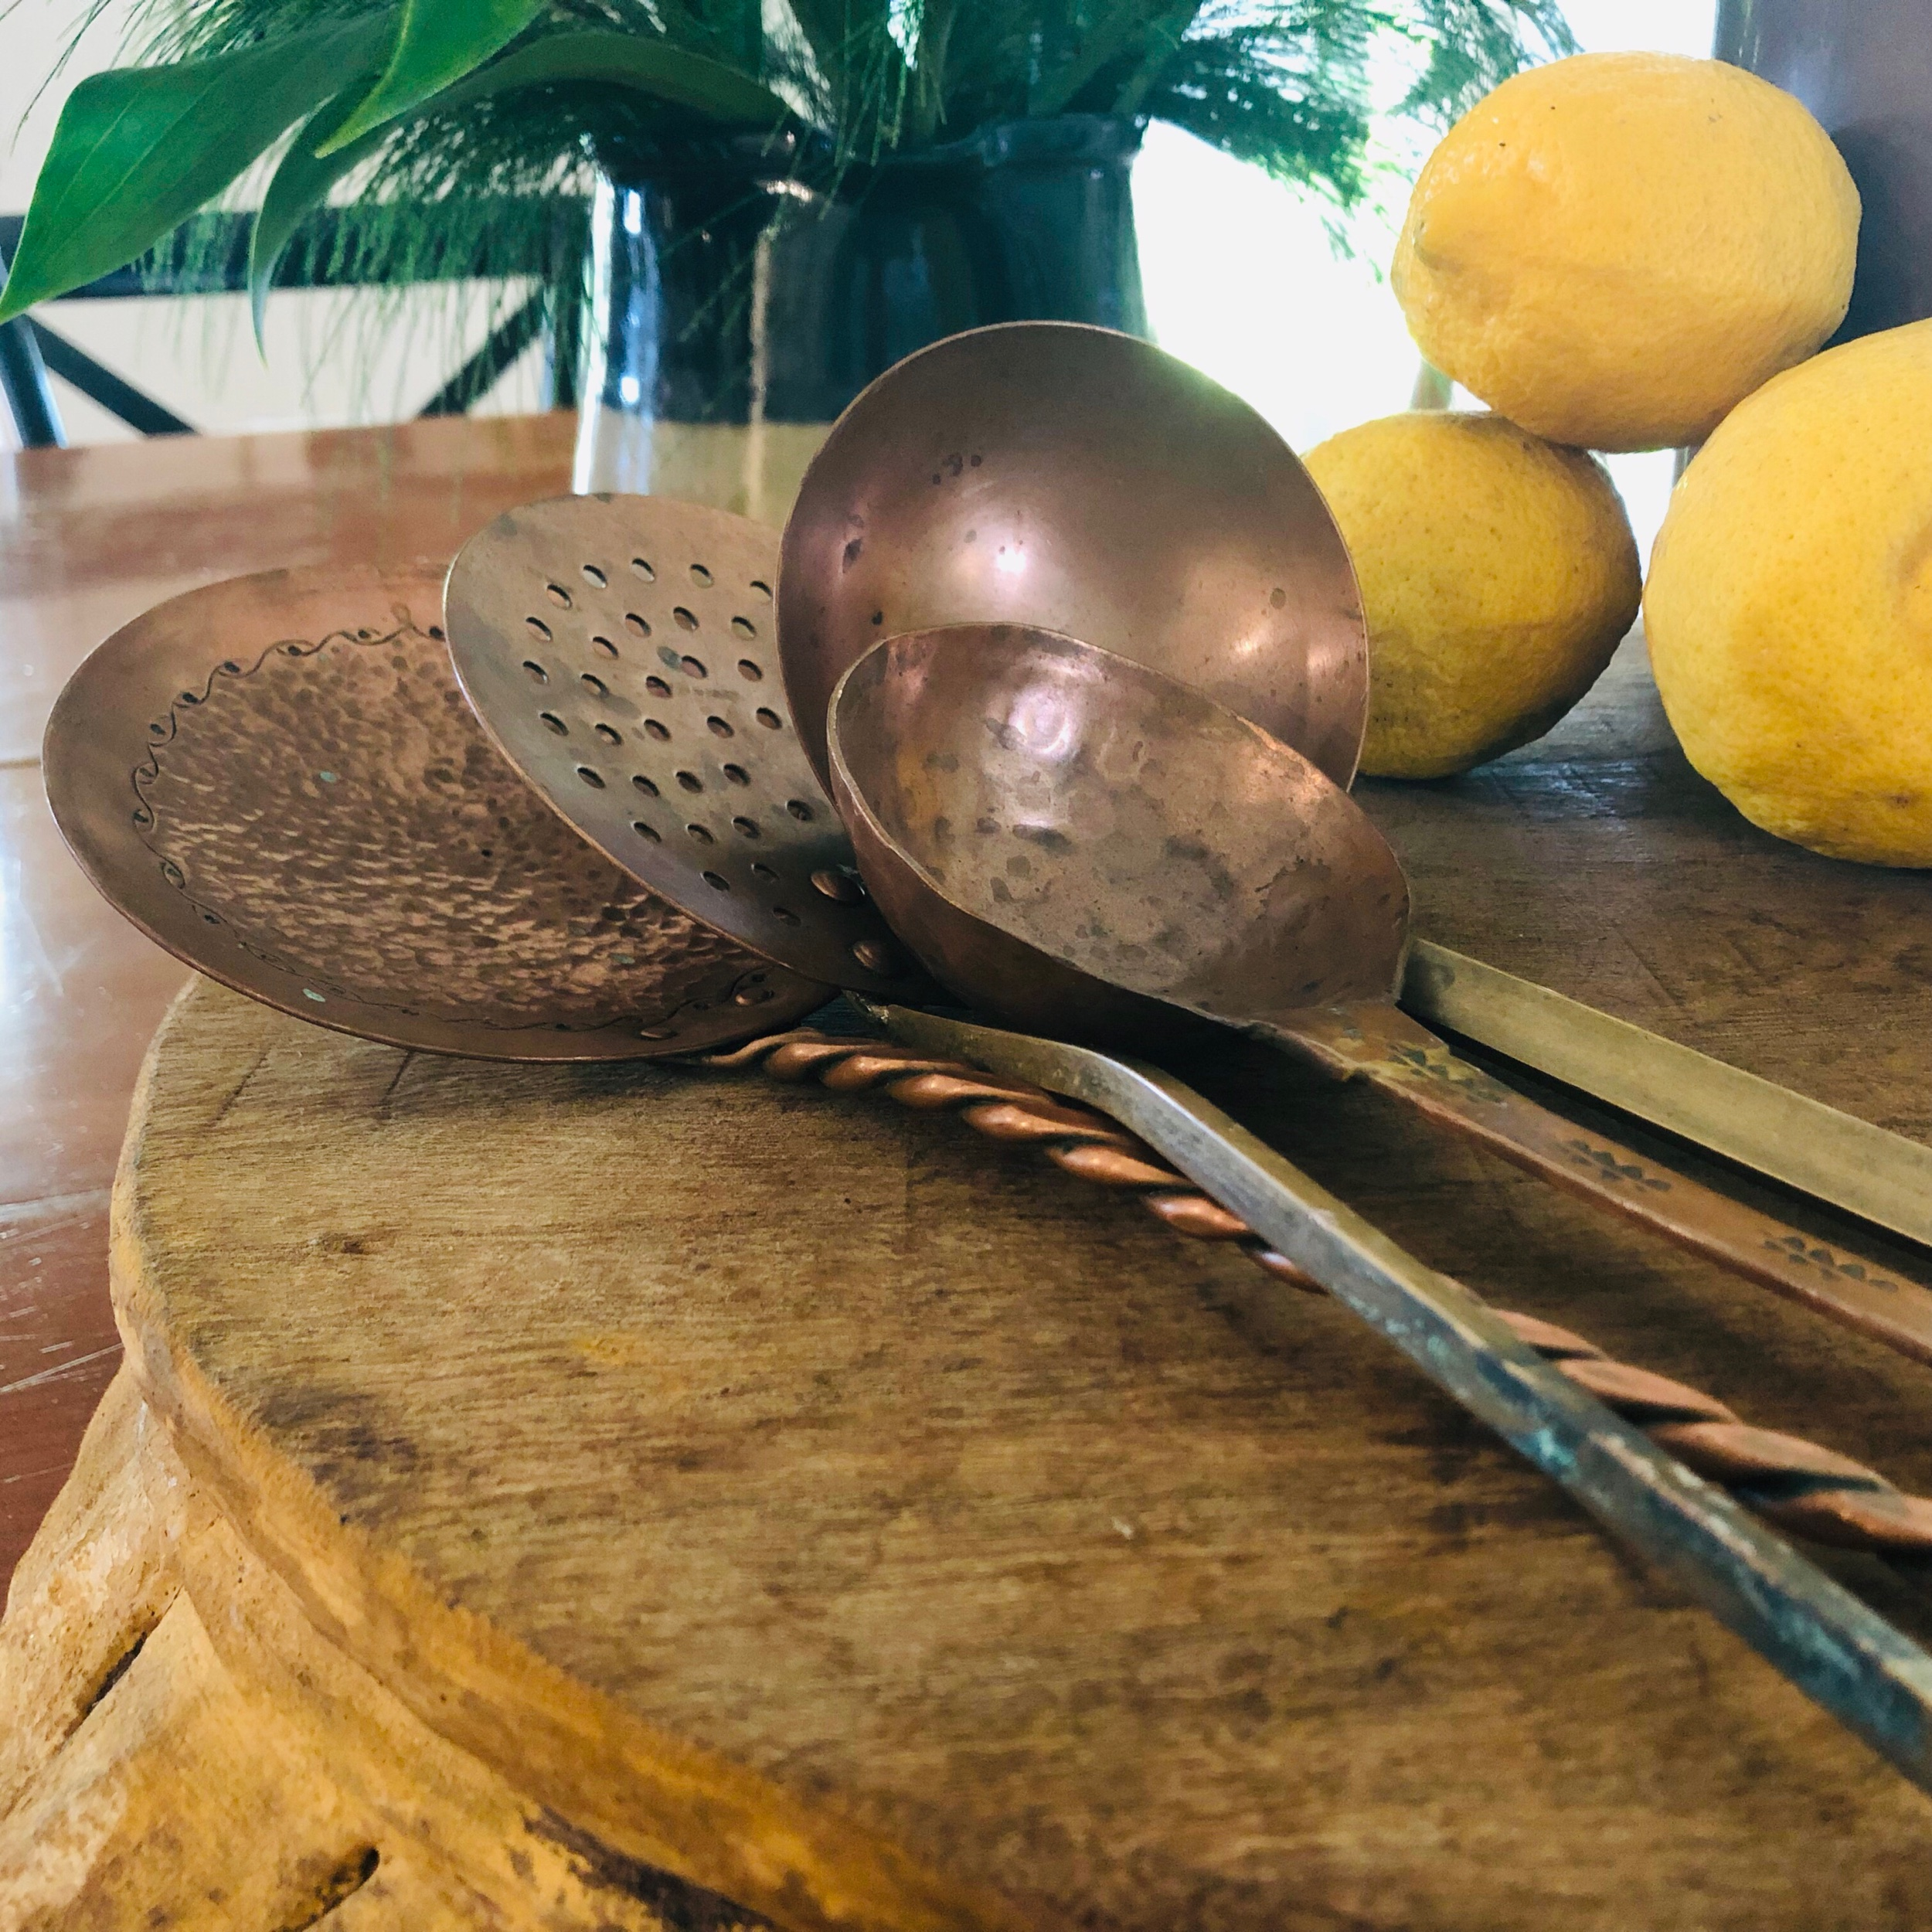 Copper utensils set of 4 $150